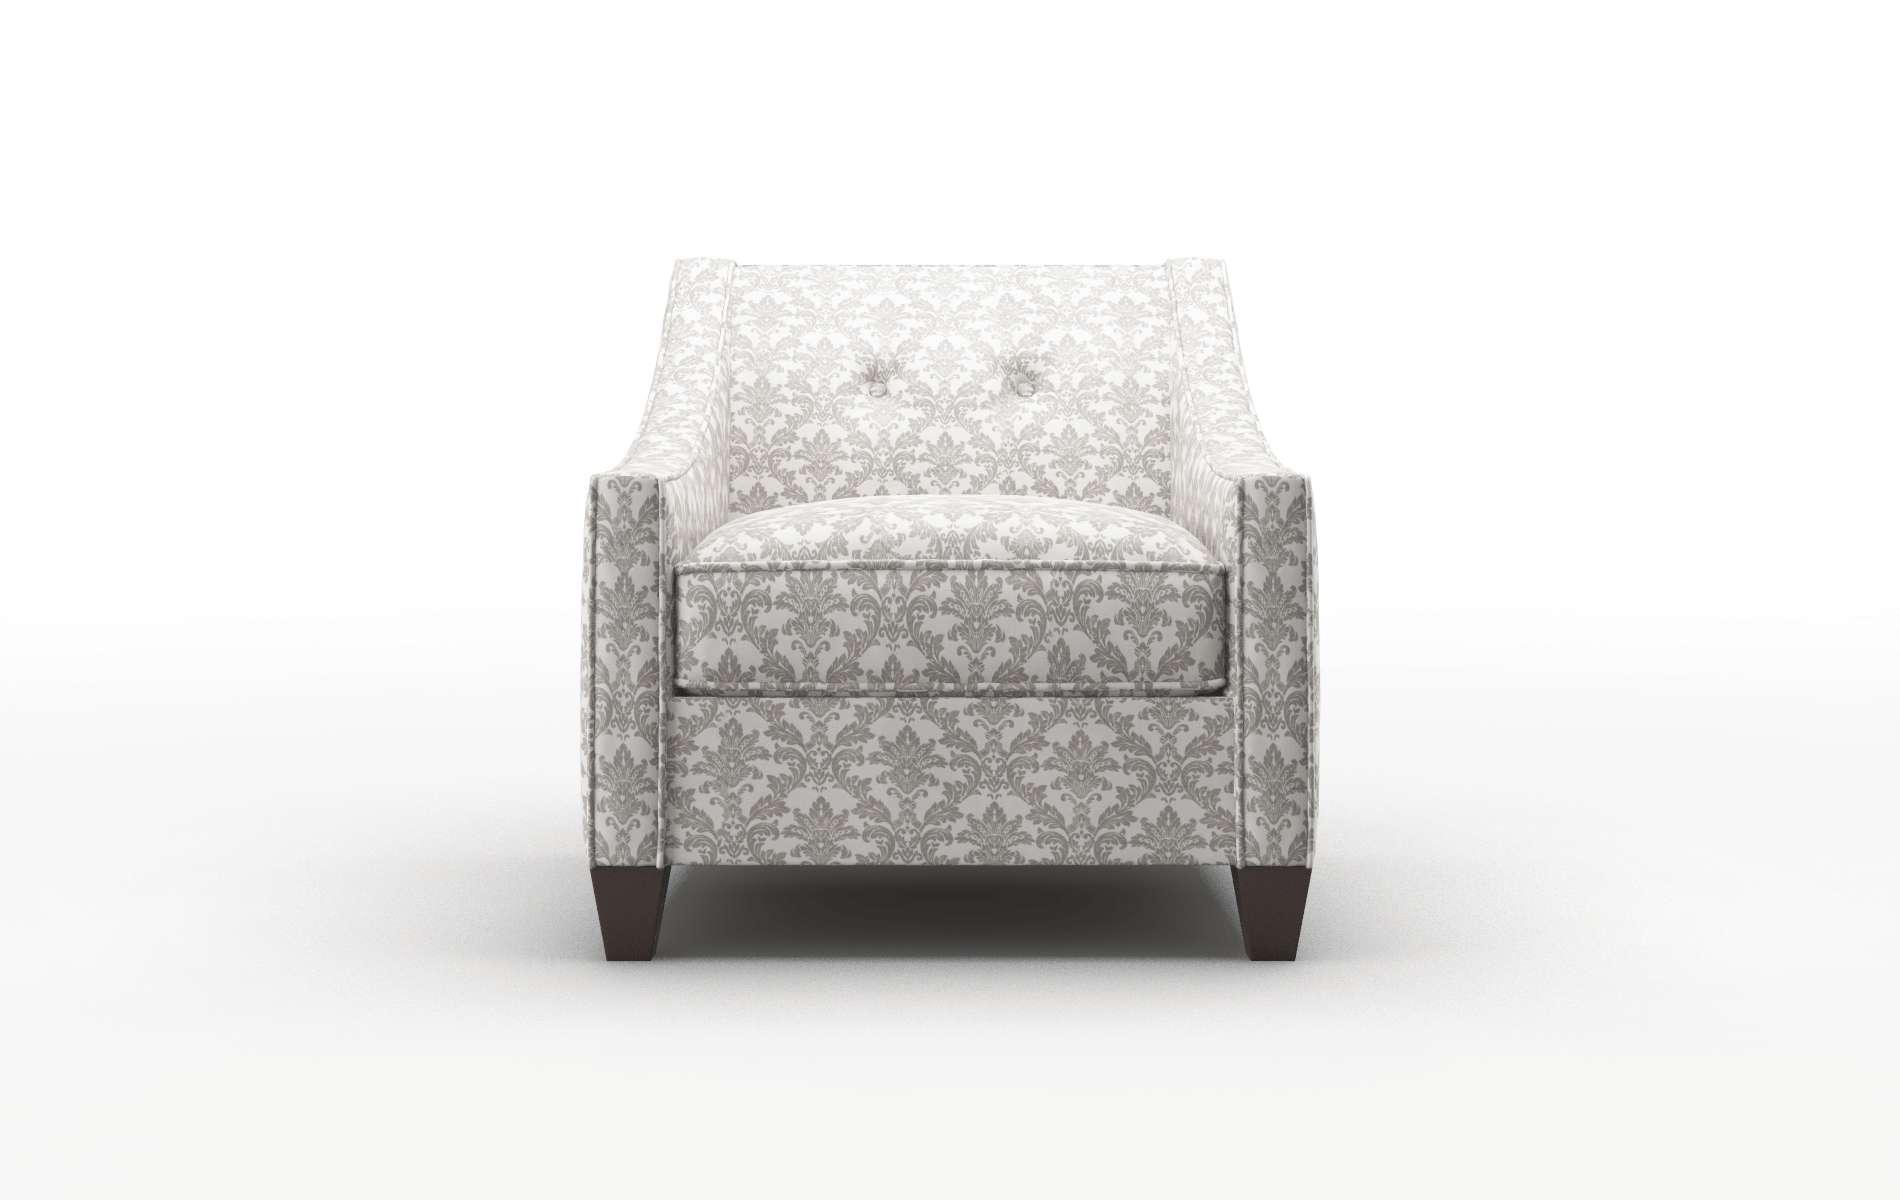 Awe Inspiring Berlin Bergamo Dove Chair Dreamsofa Evergreenethics Interior Chair Design Evergreenethicsorg